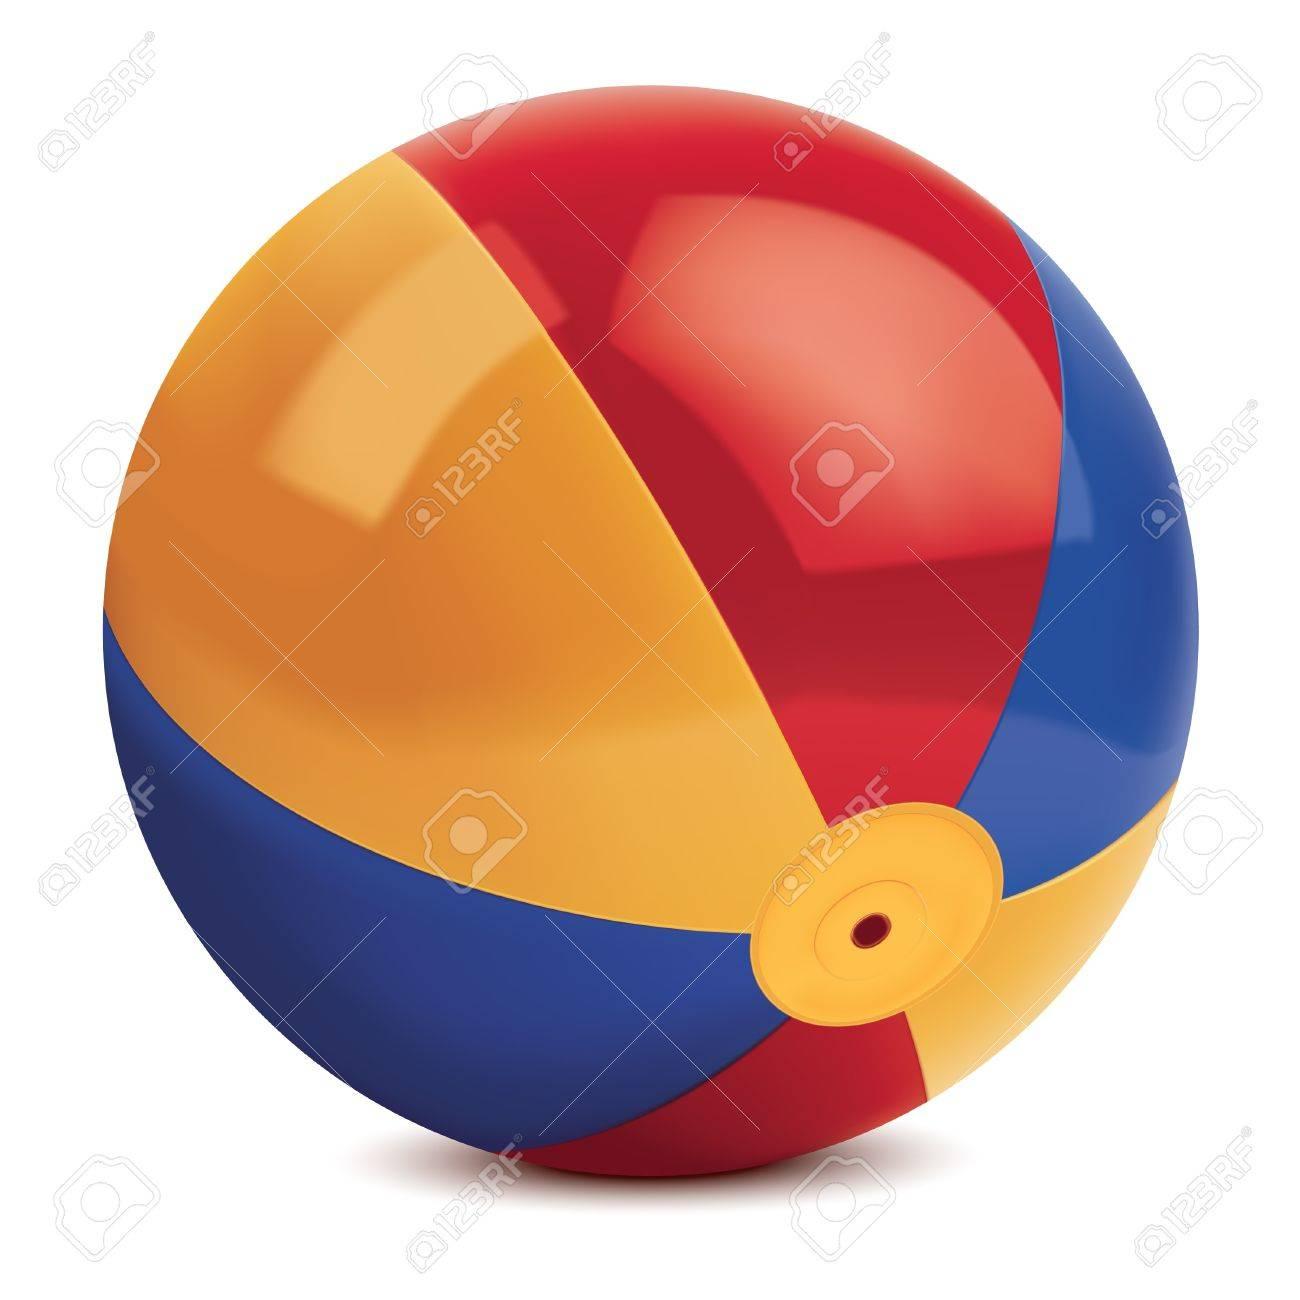 Beach ball. illustration Stock Vector - 17013481